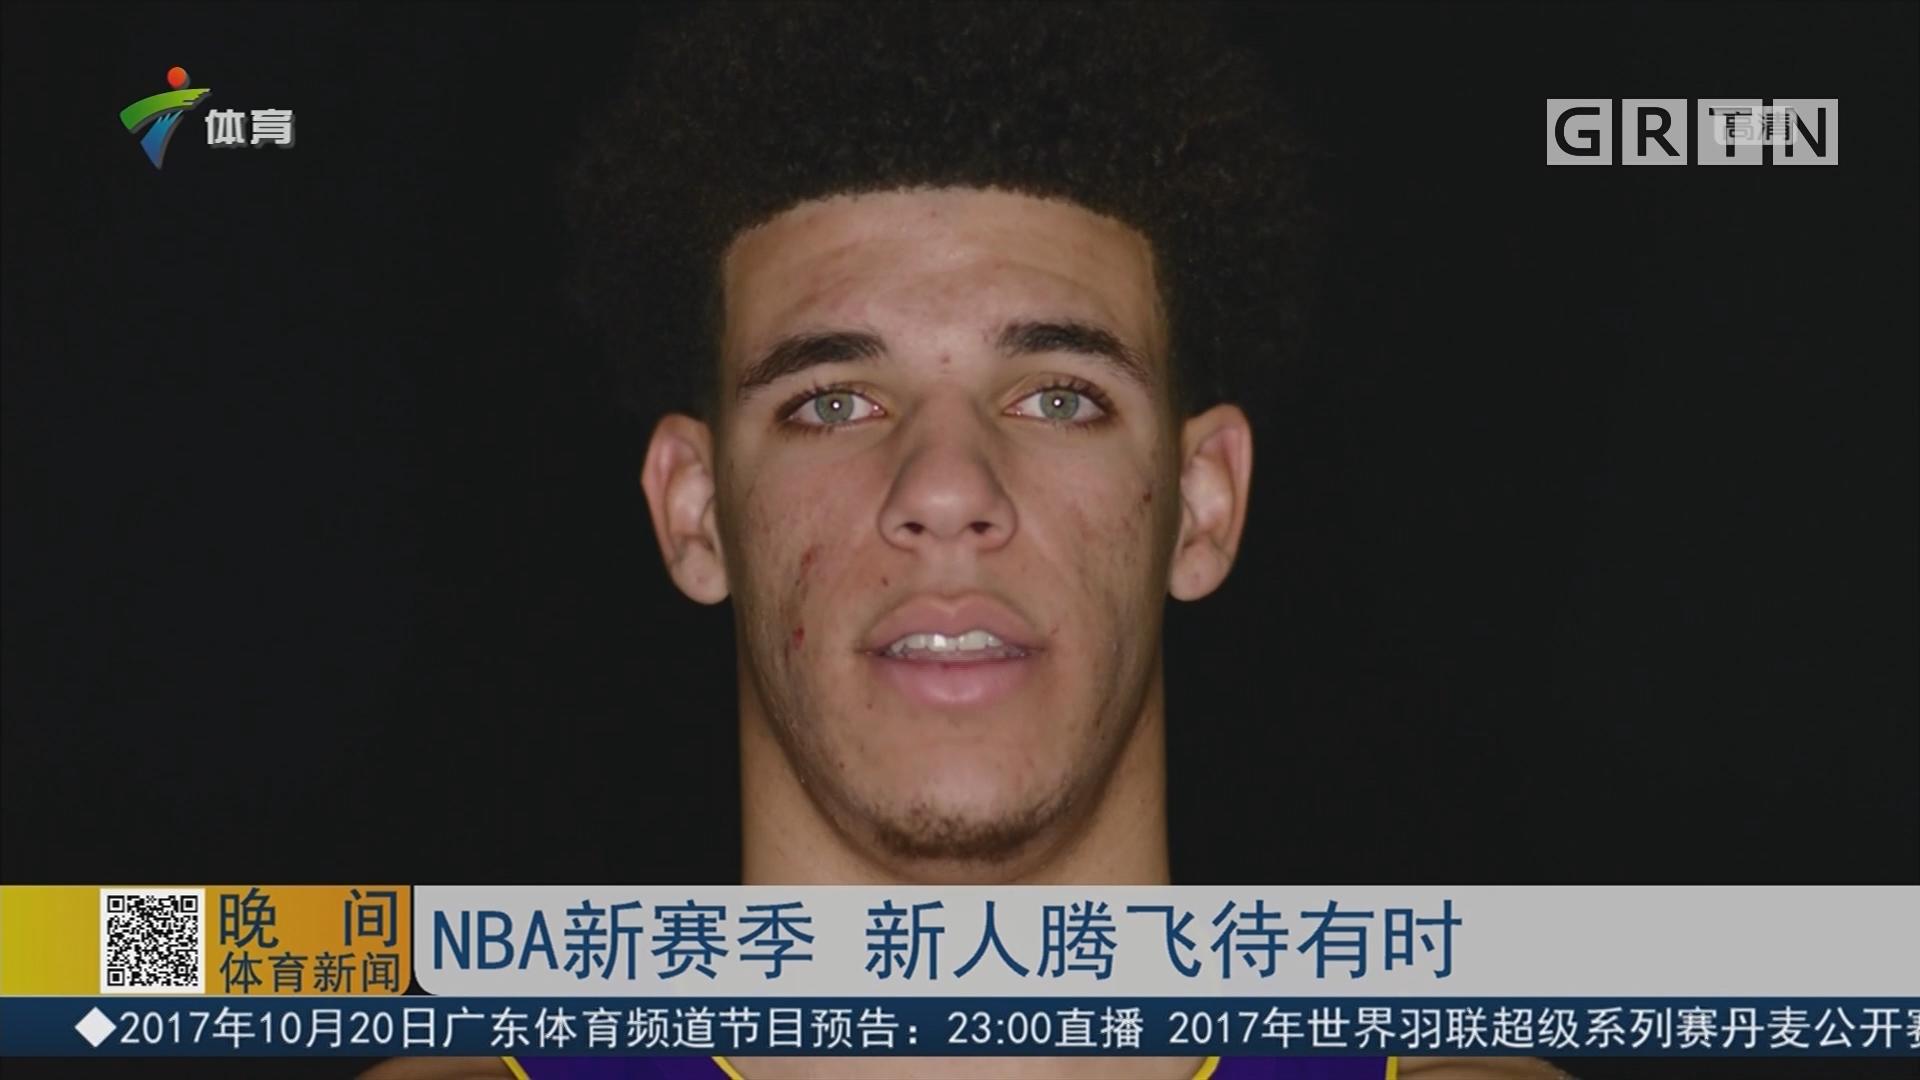 NBA新赛季 新人腾飞待有时